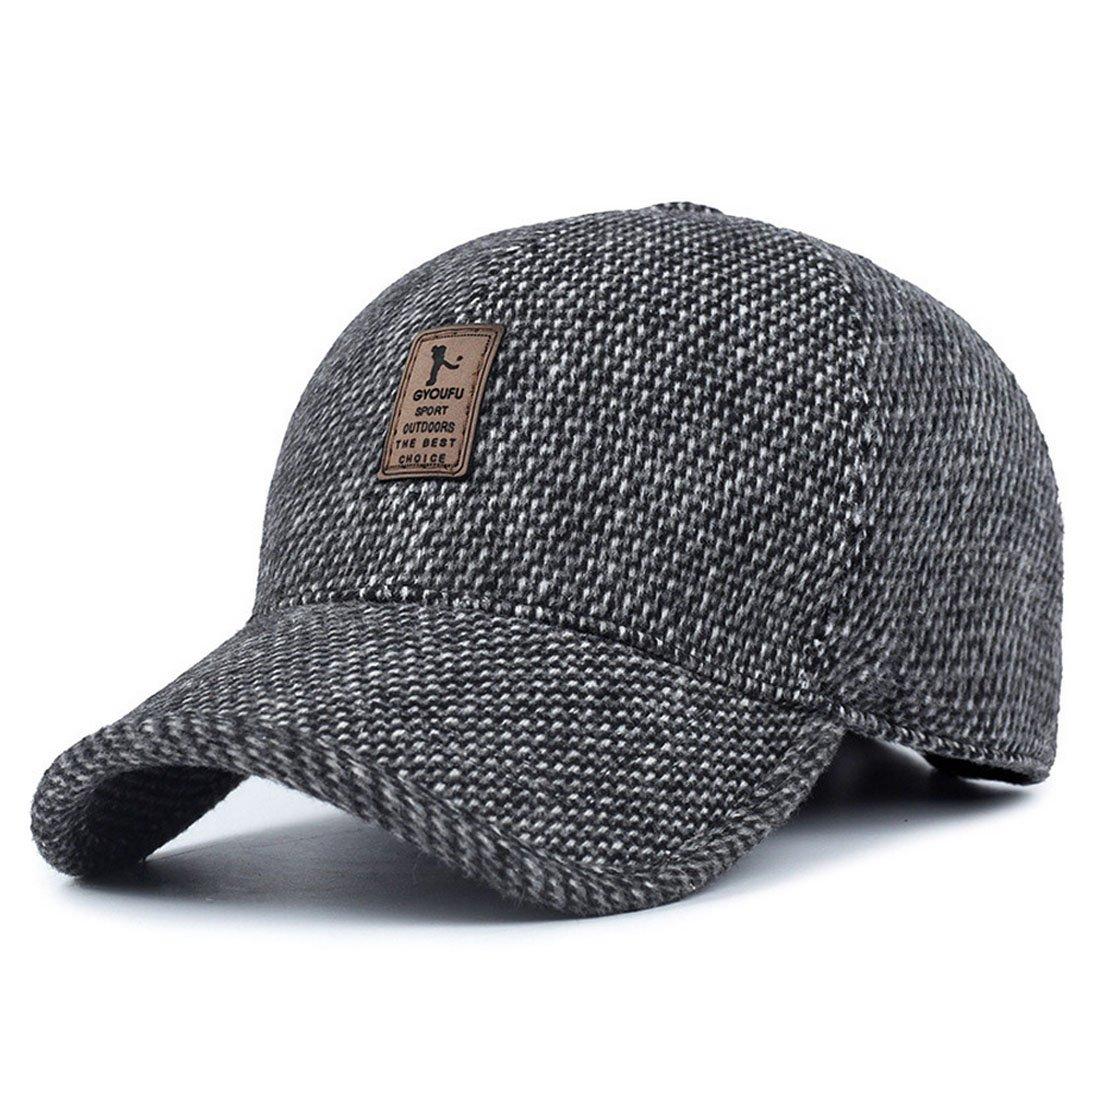 2e10369d REGITWOW Men's Warm Wool Woolen Tweed Peaked Baseball Caps Hat with Fold  Earmuffs Warmer Black at Amazon Men's Clothing store: